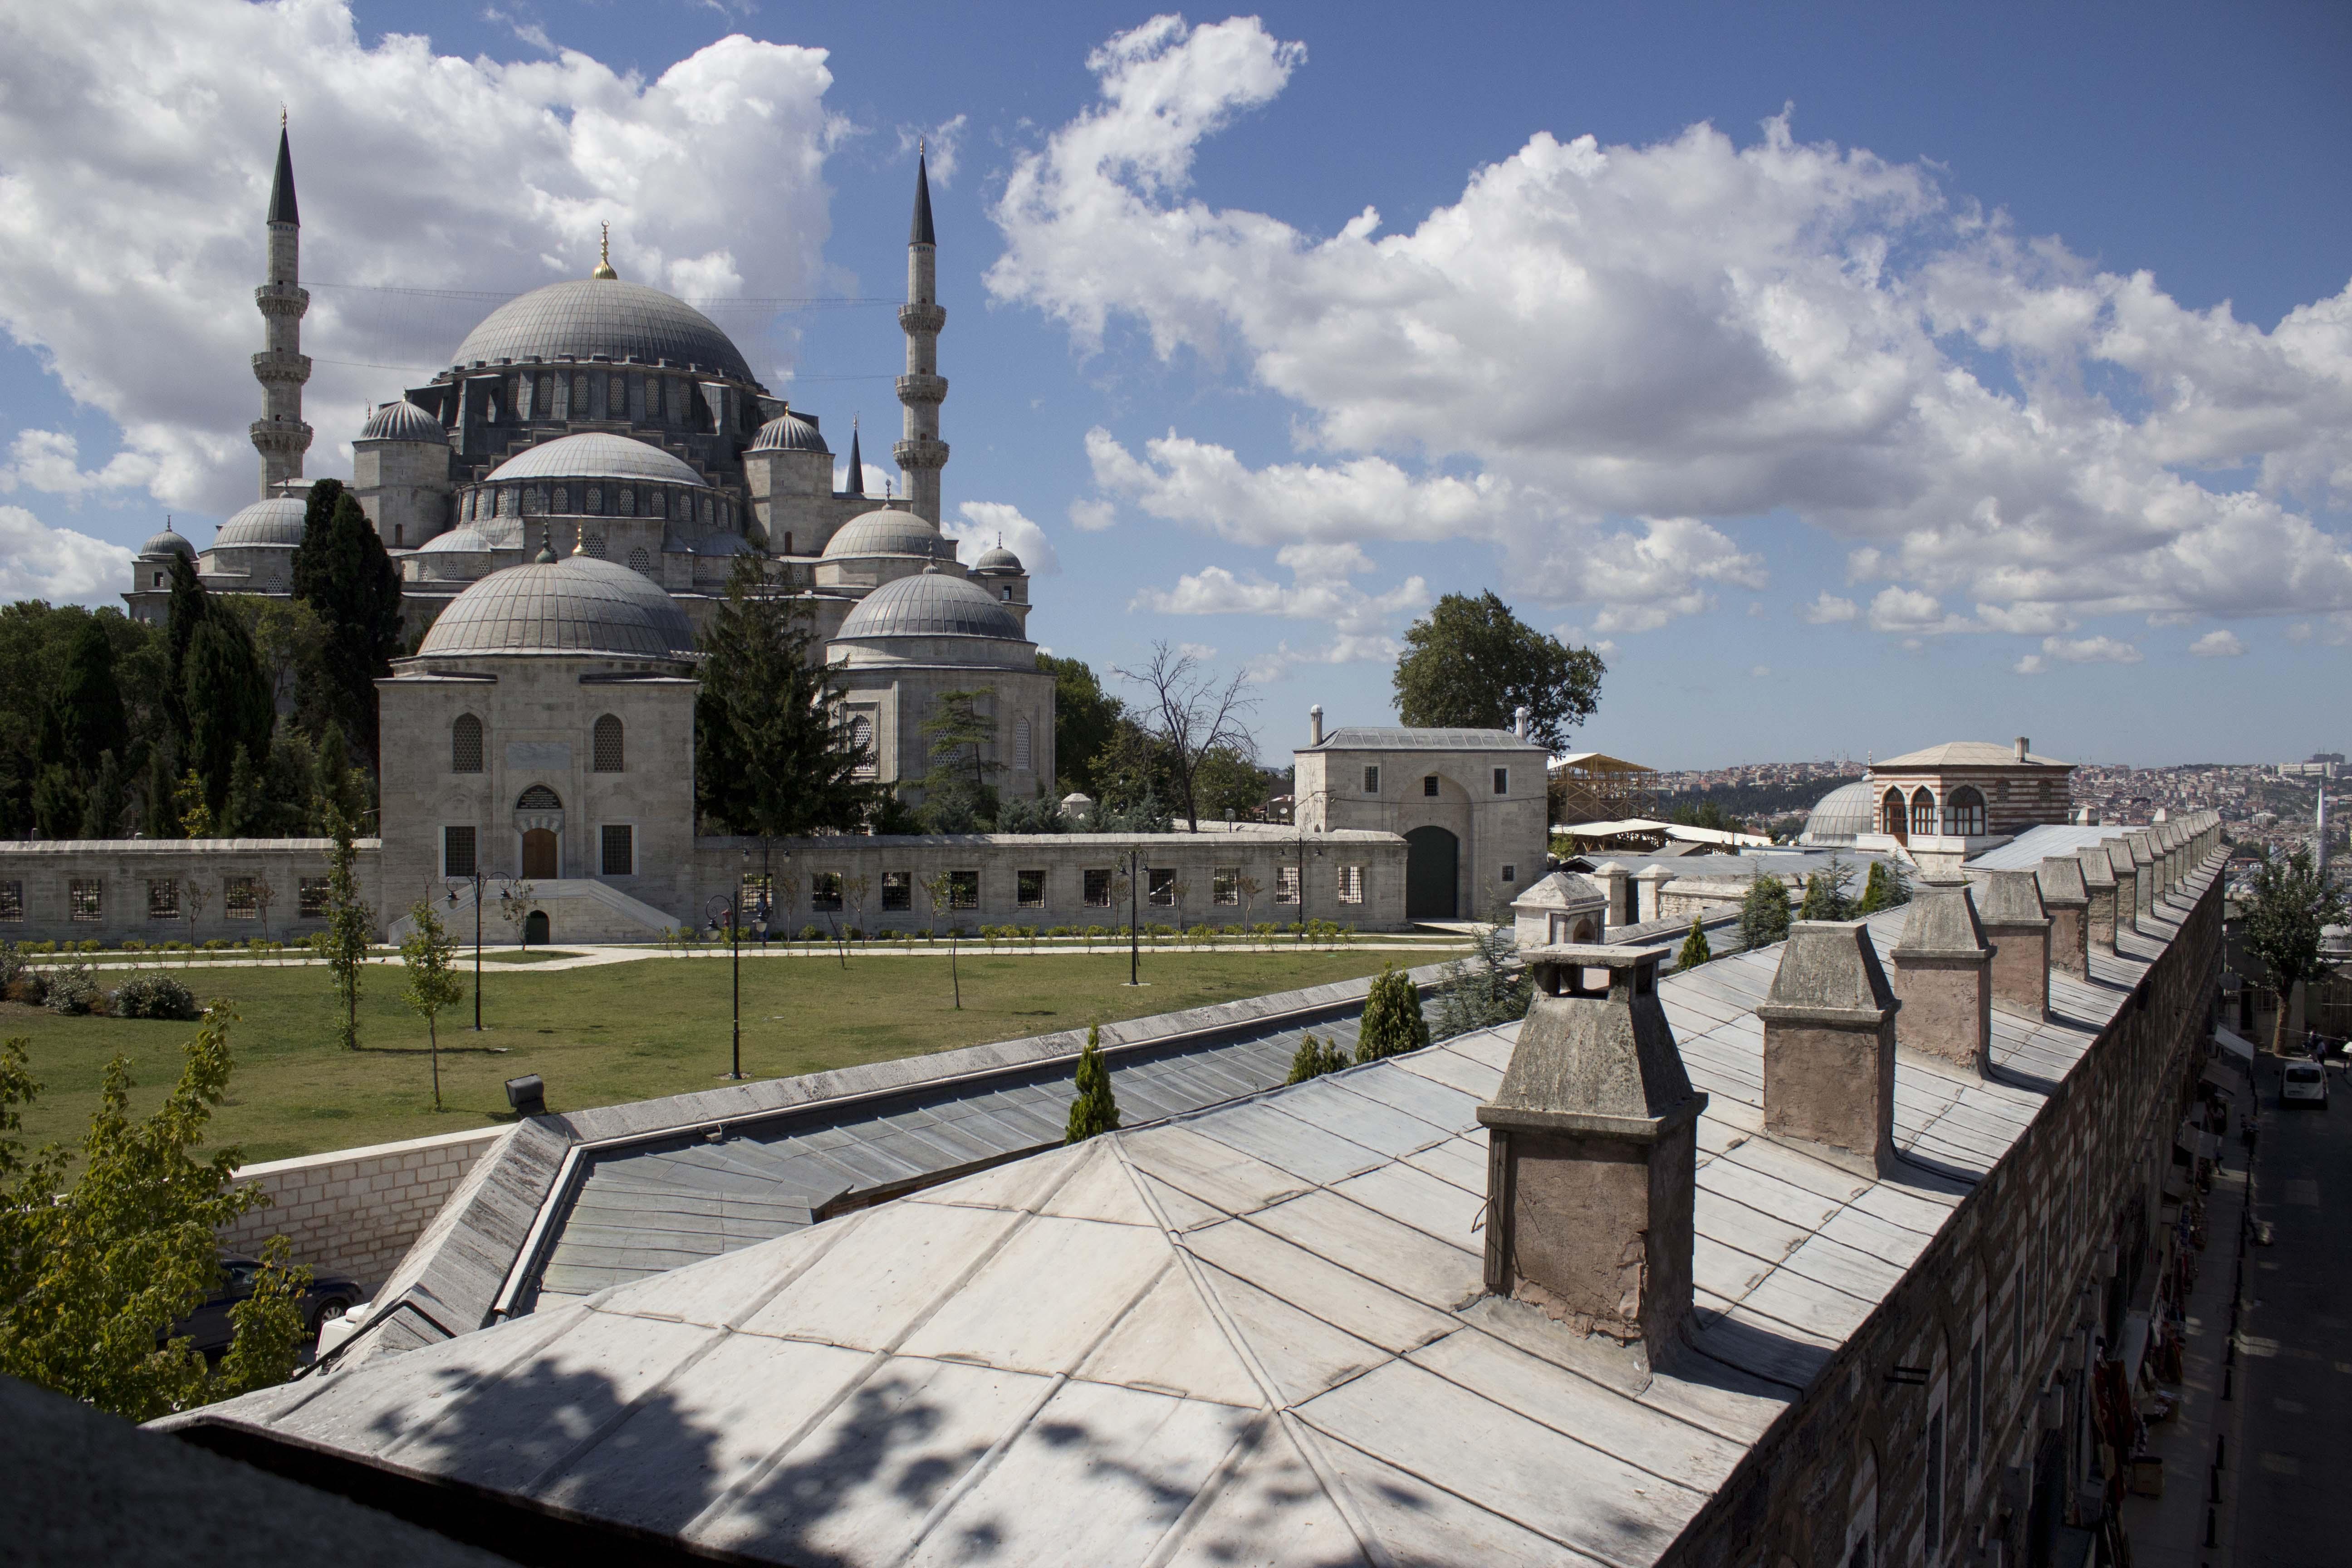 File:Süleymaniye Mosque.jpg - Wikimedia Commons